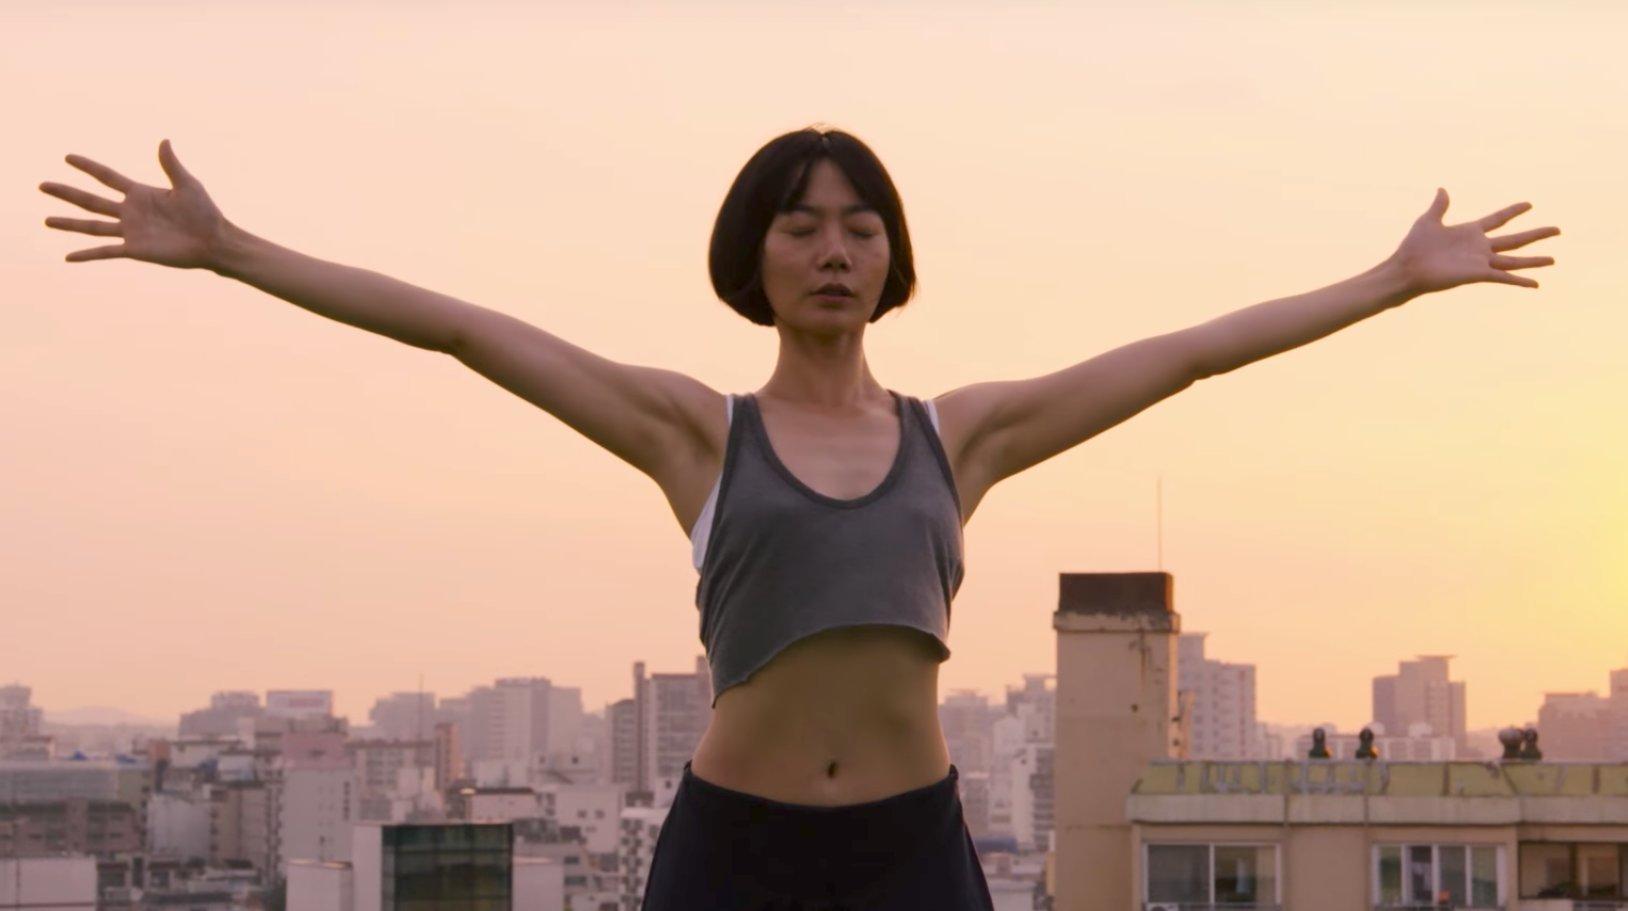 Sun Bak is played by Doona Bae